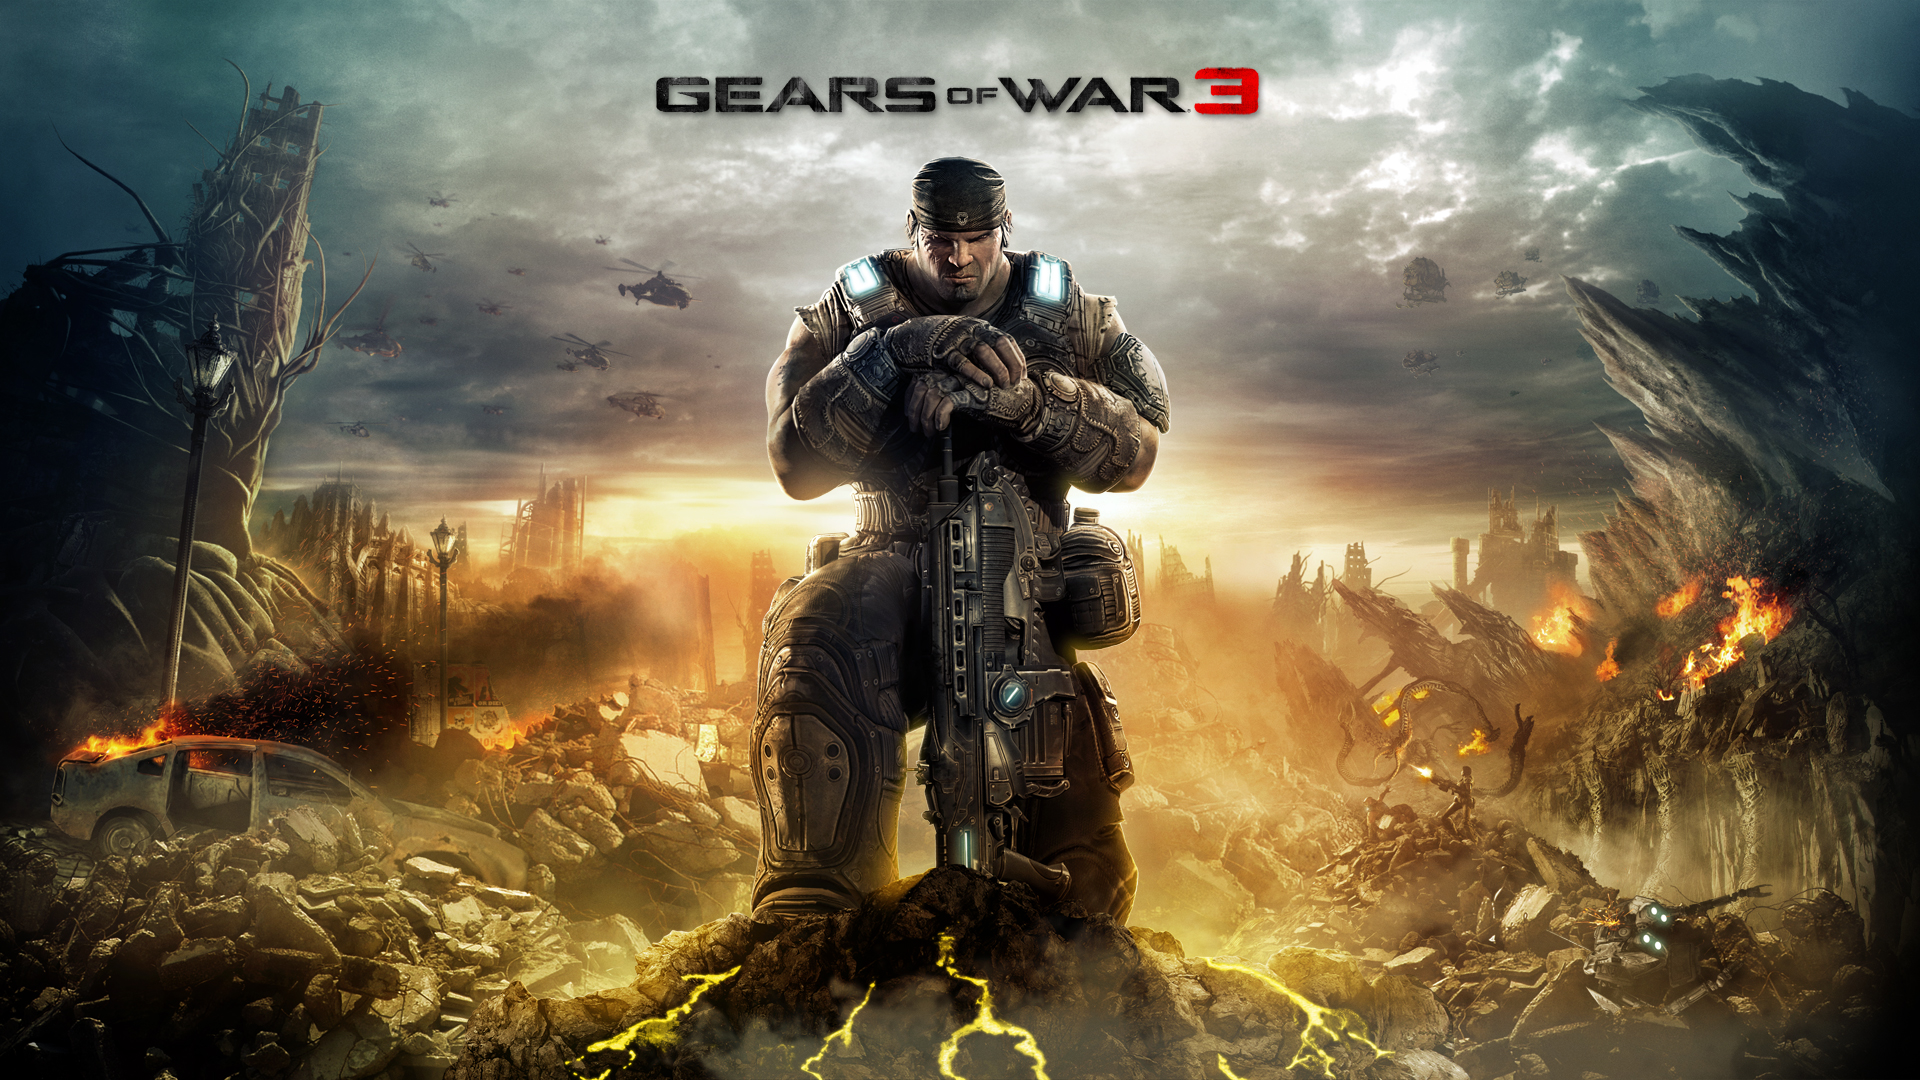 Gears of War 3 Wallpapers Risen Sources 1920x1080